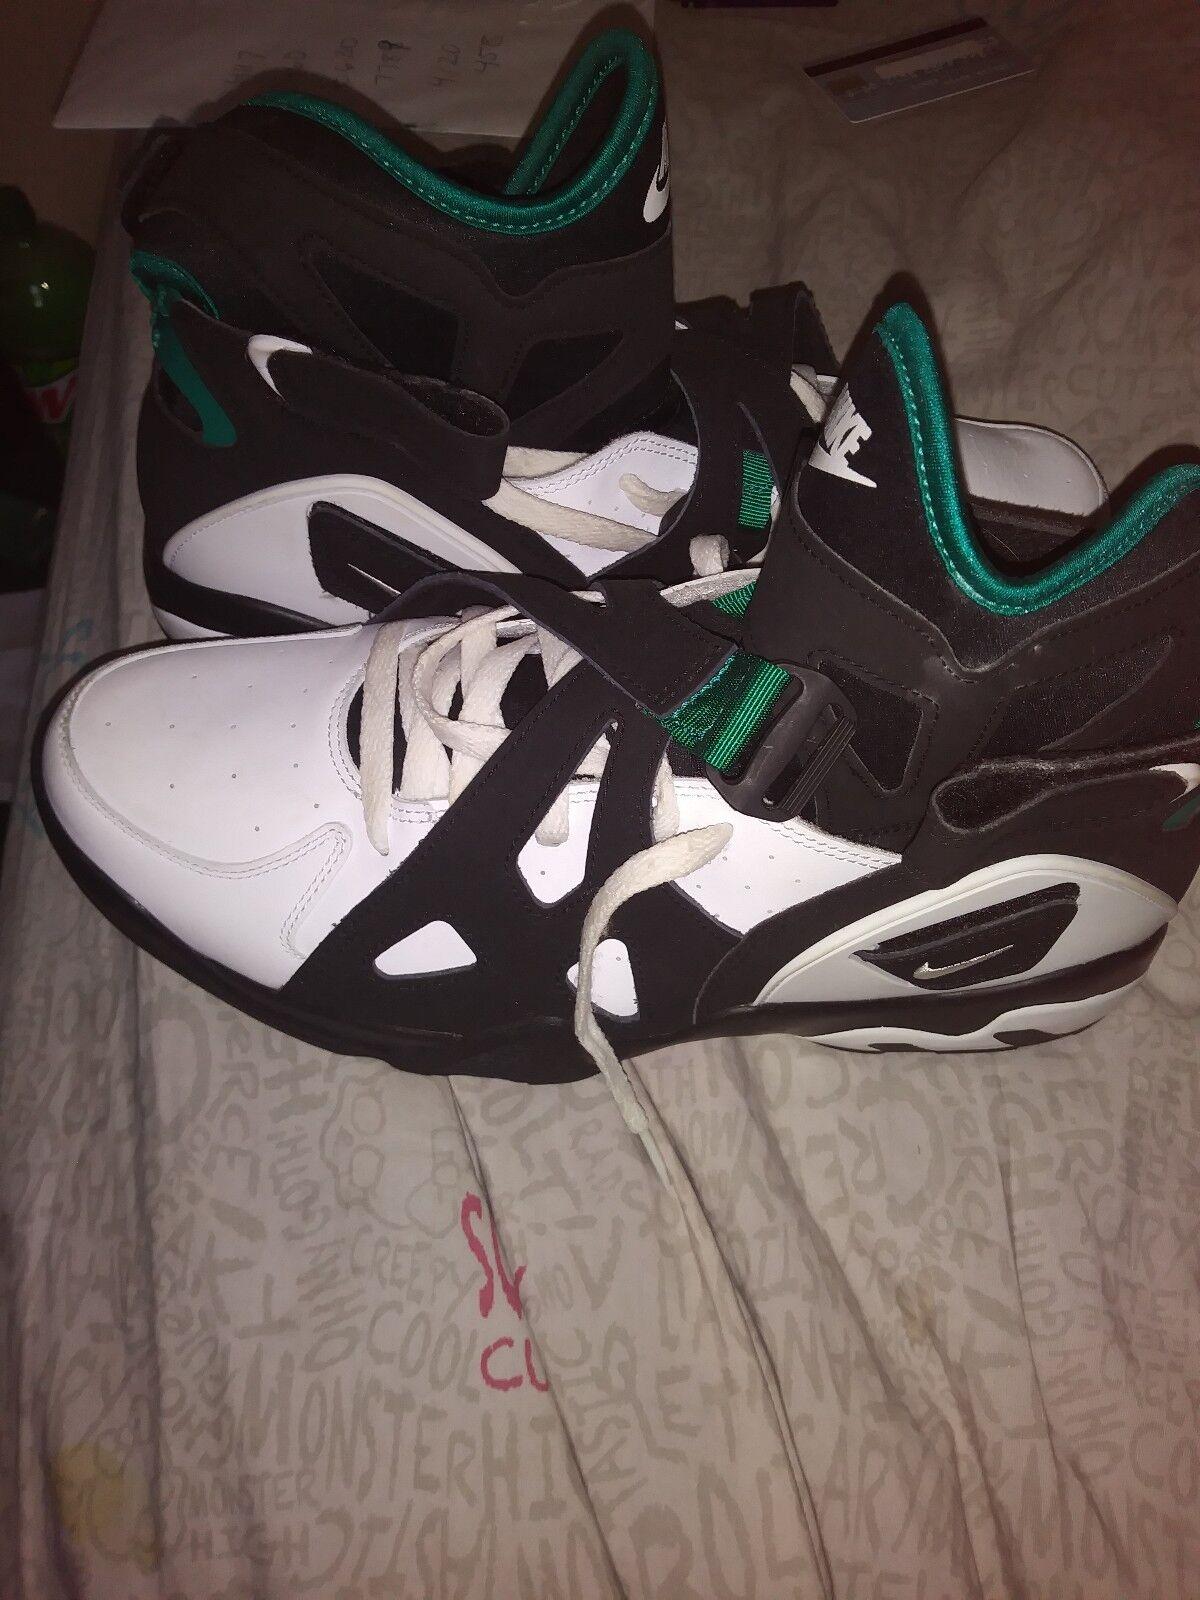 Nike Air Unlimited Black White Emerald Green 889013 001 Men Sizes 11